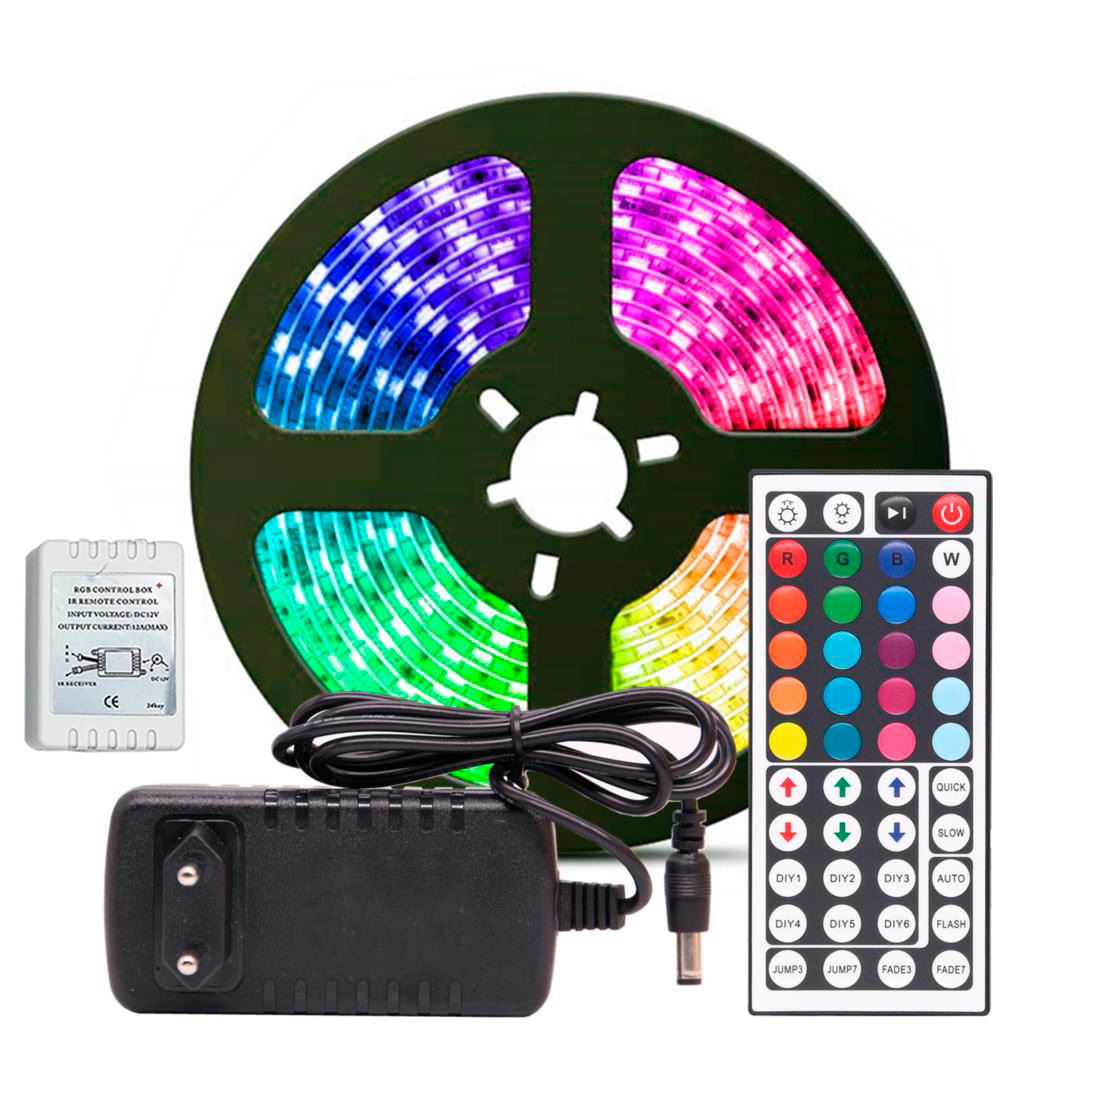 Fita LED RGB 5050 5 metros Fonte 3A Controle 44 Teclas DIY